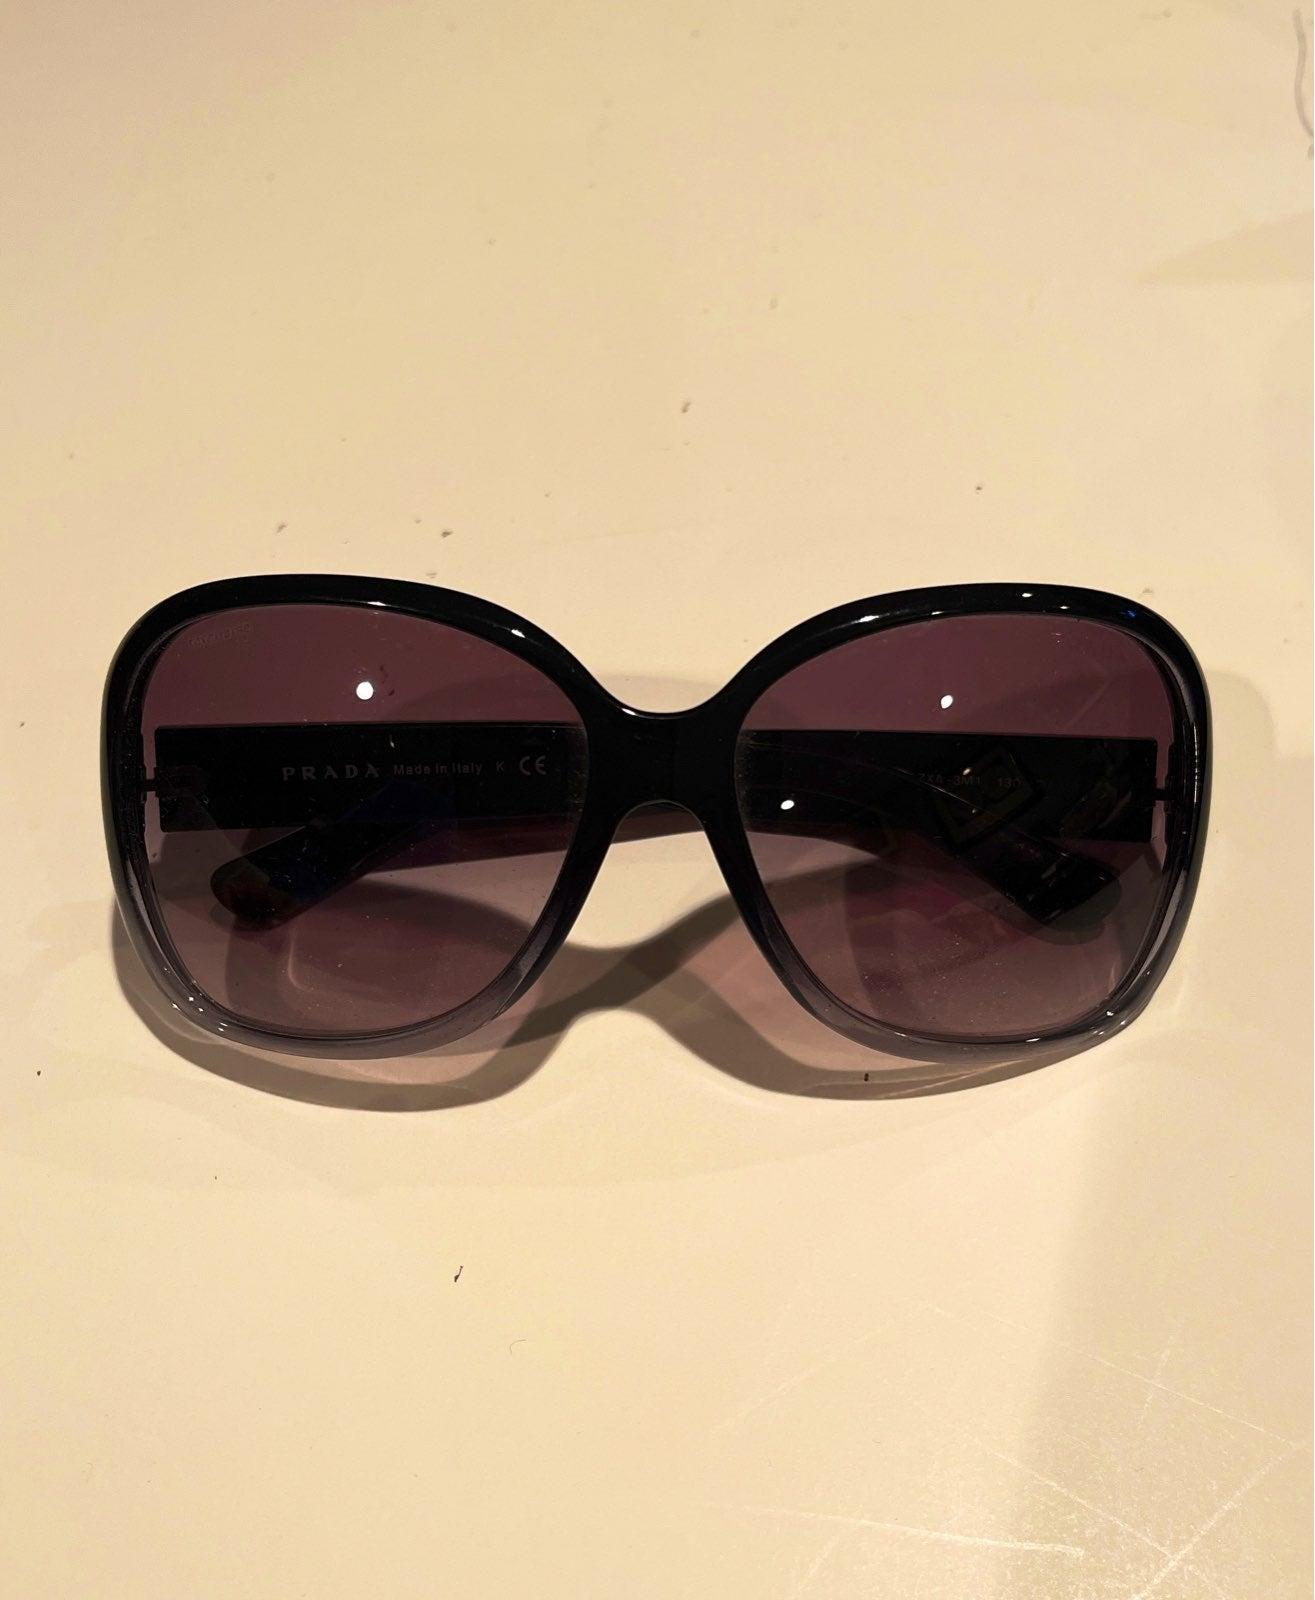 Prada Sunglasses SPR27M